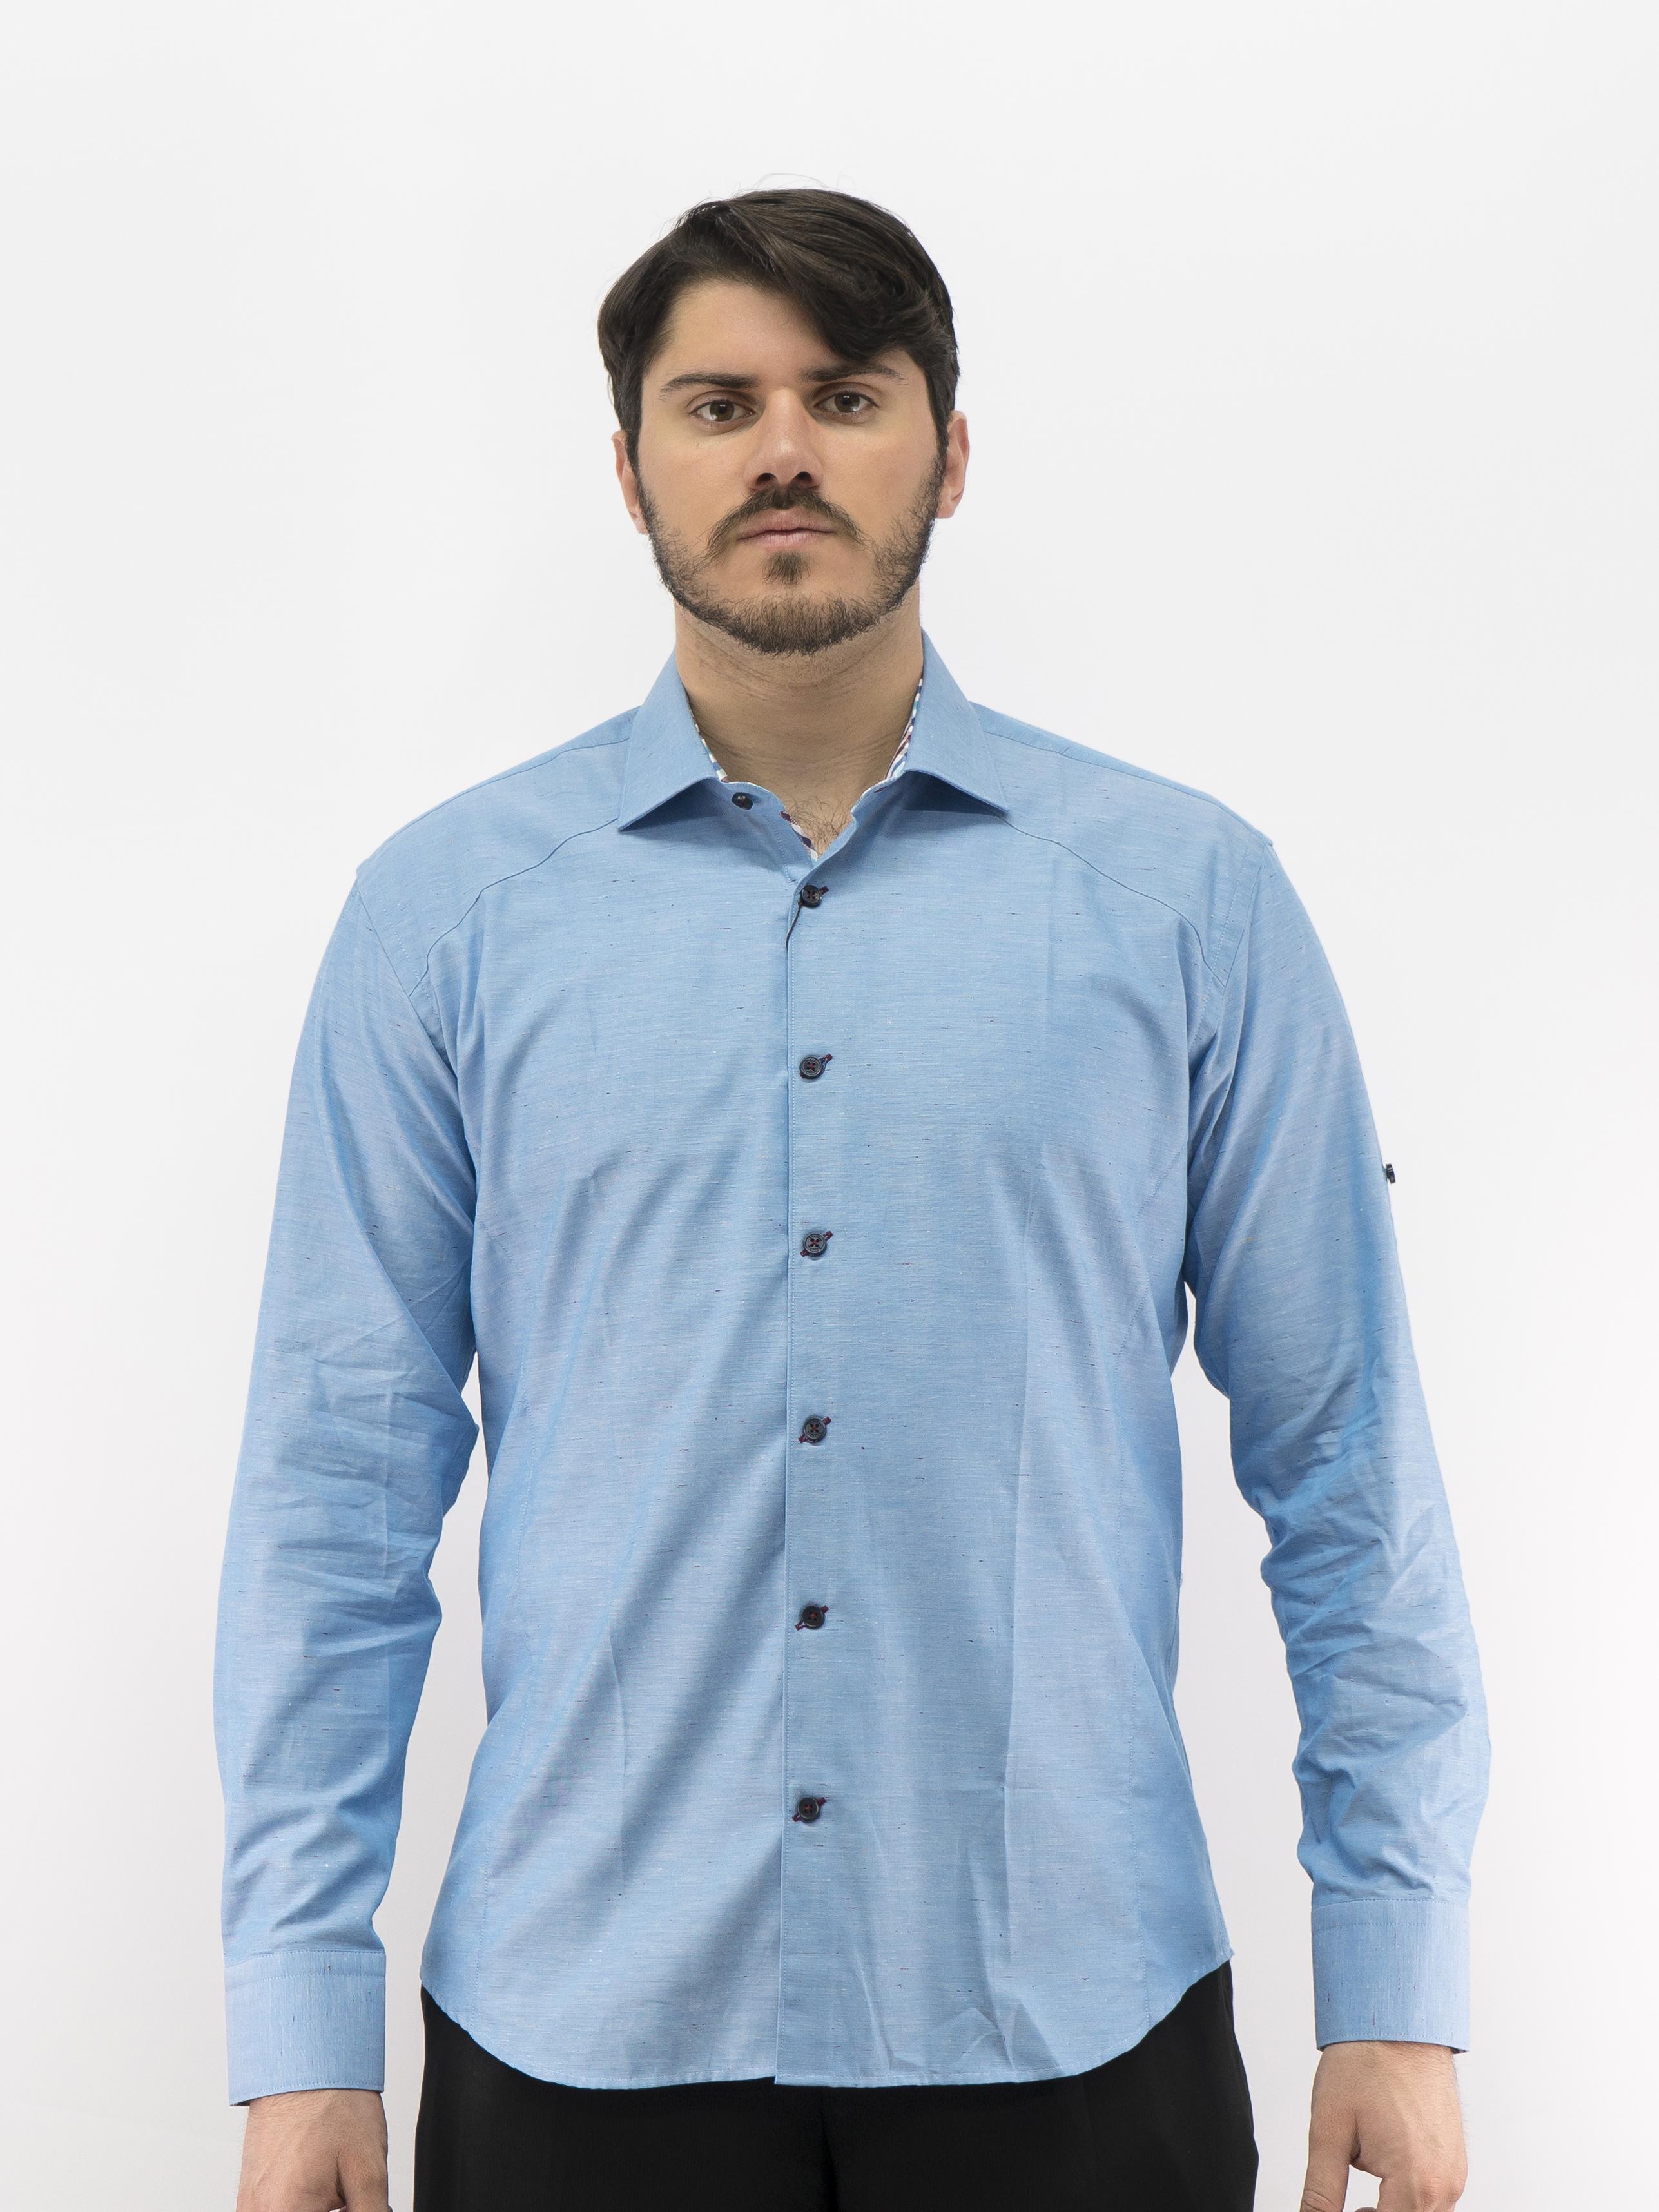 D\'Accord Men\'s Long Sleeve Dress Shirt Blue 100% Fine Cotton 4480 ...